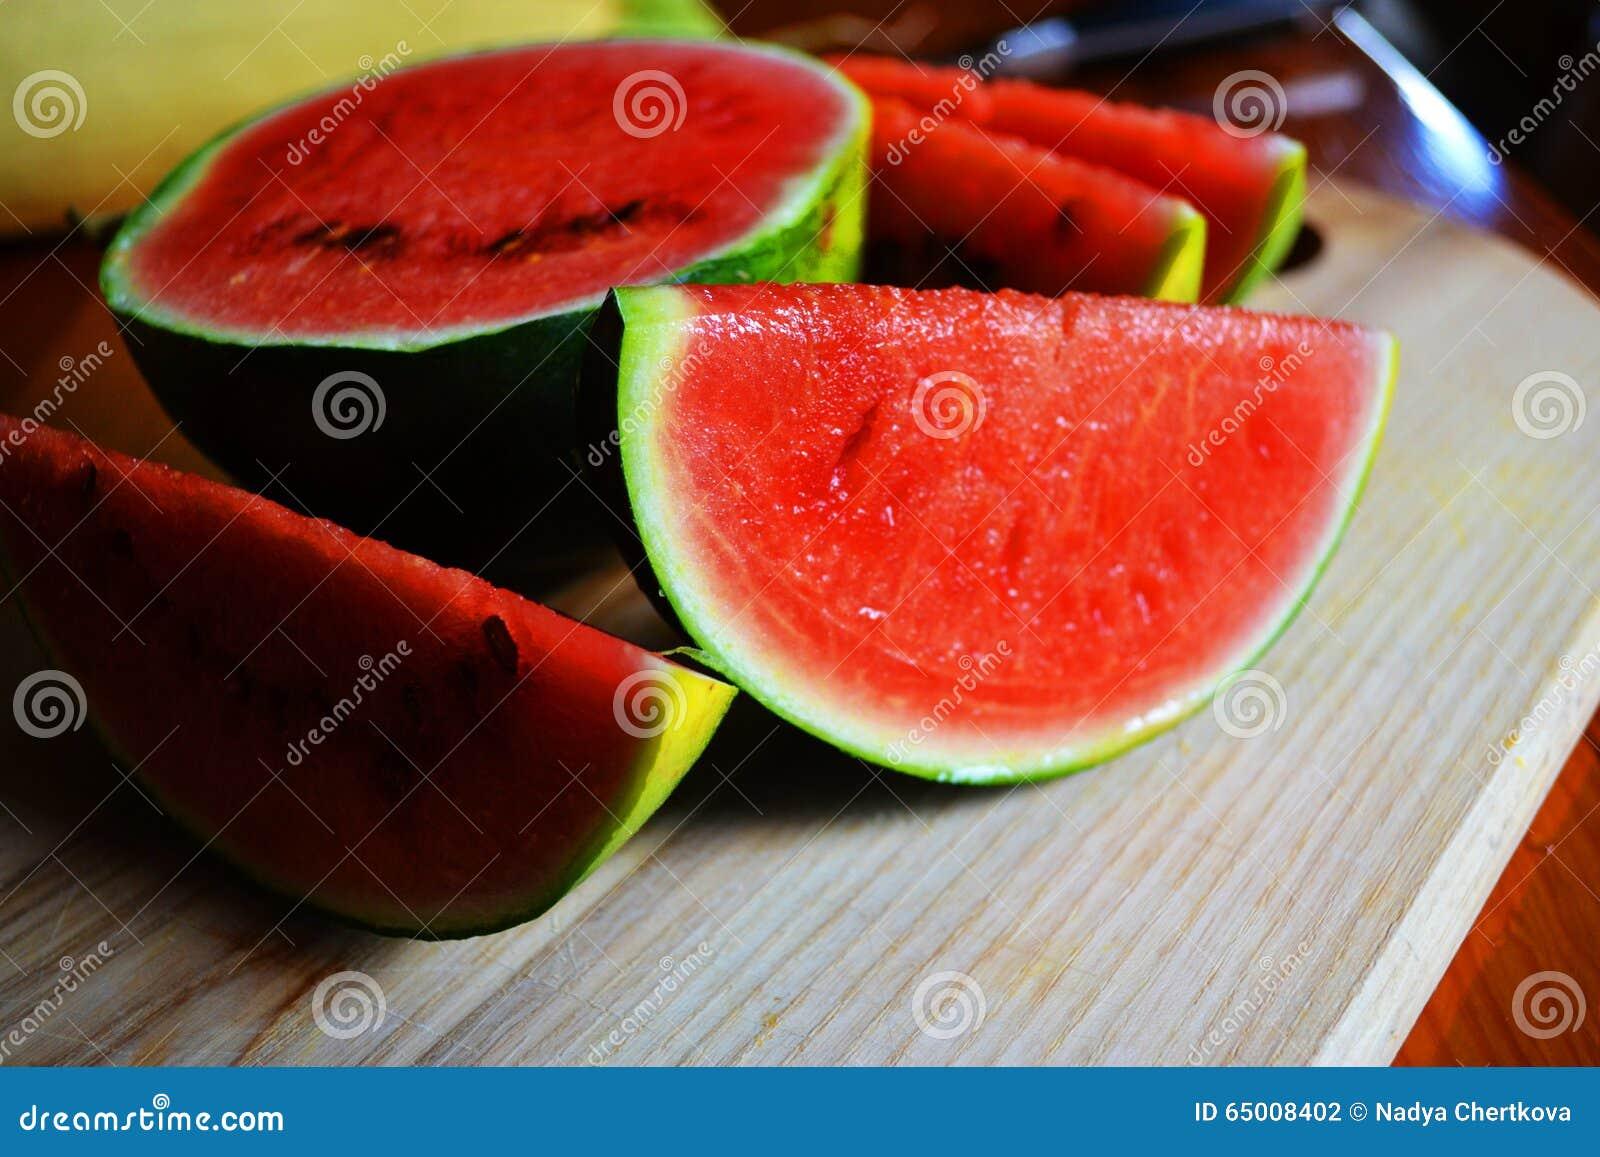 taste of melon Kajari melon, cucumis melo,  the taste of the kajari is a sweet cross of a honey dew and a cantaloupe  baker creek heirloom seeds.